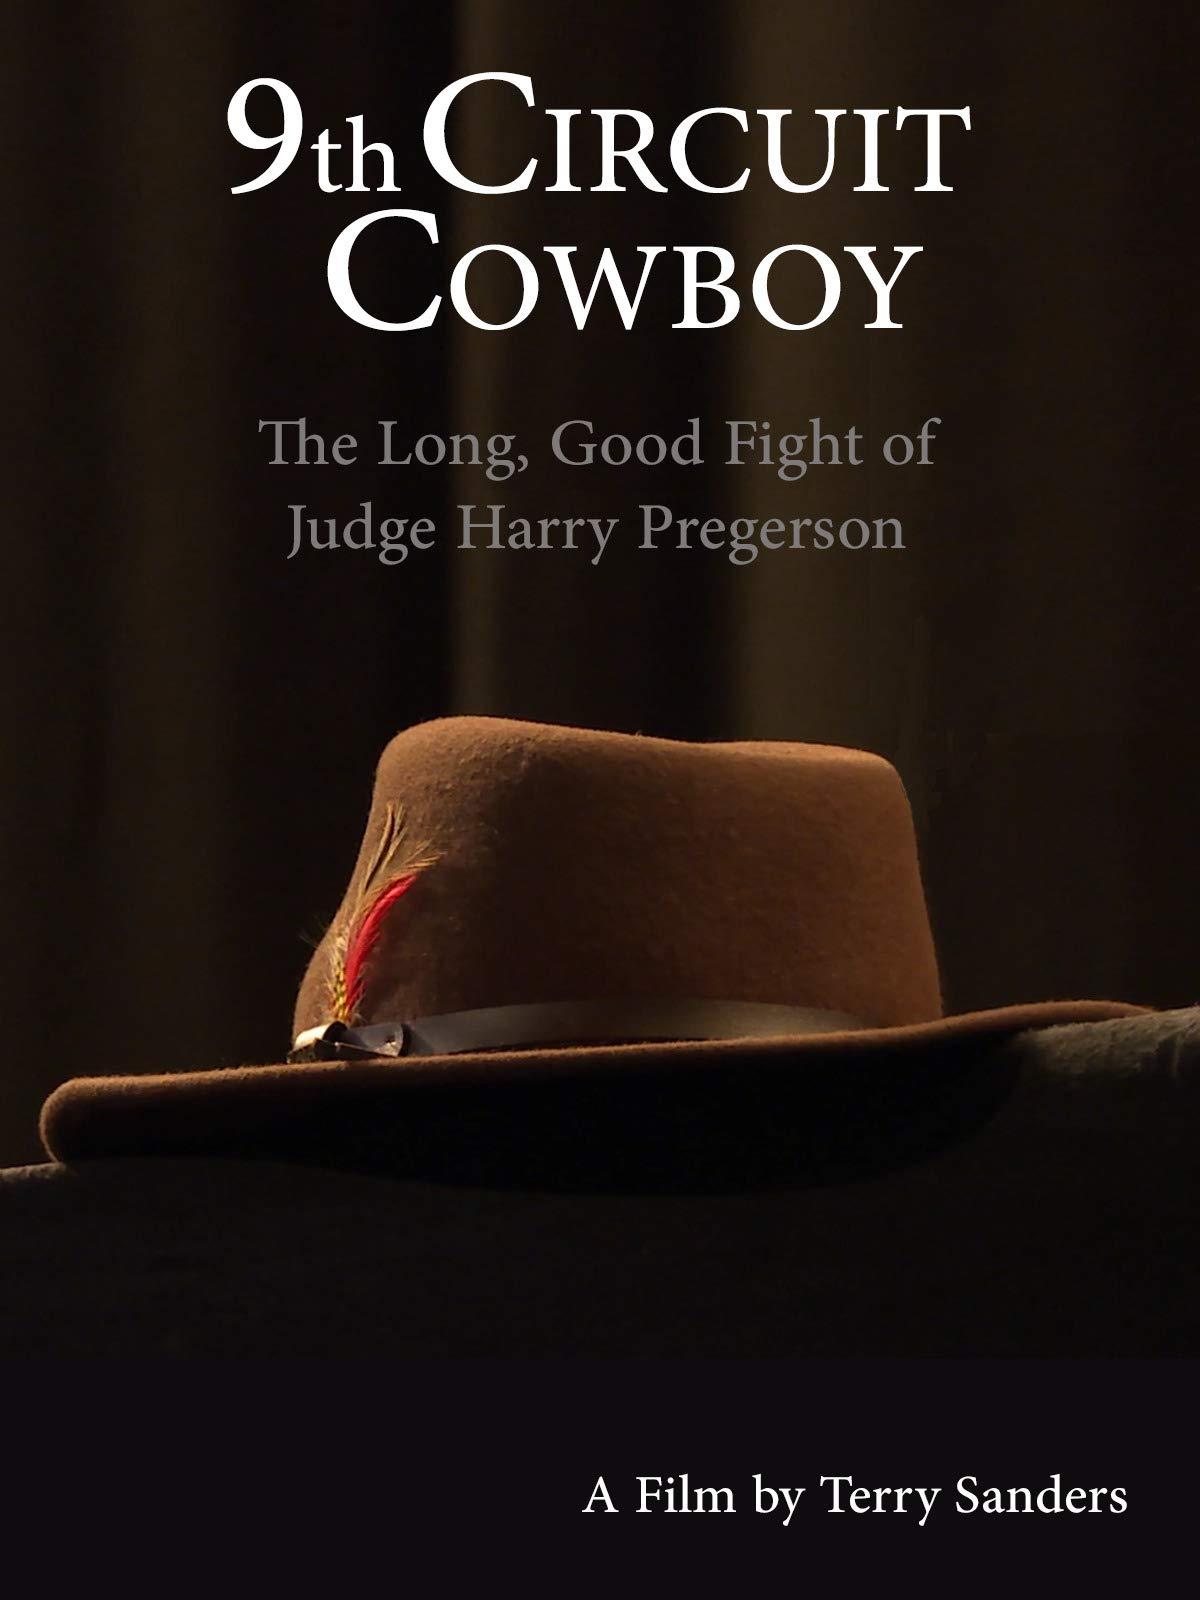 9th Circuit Cowboy